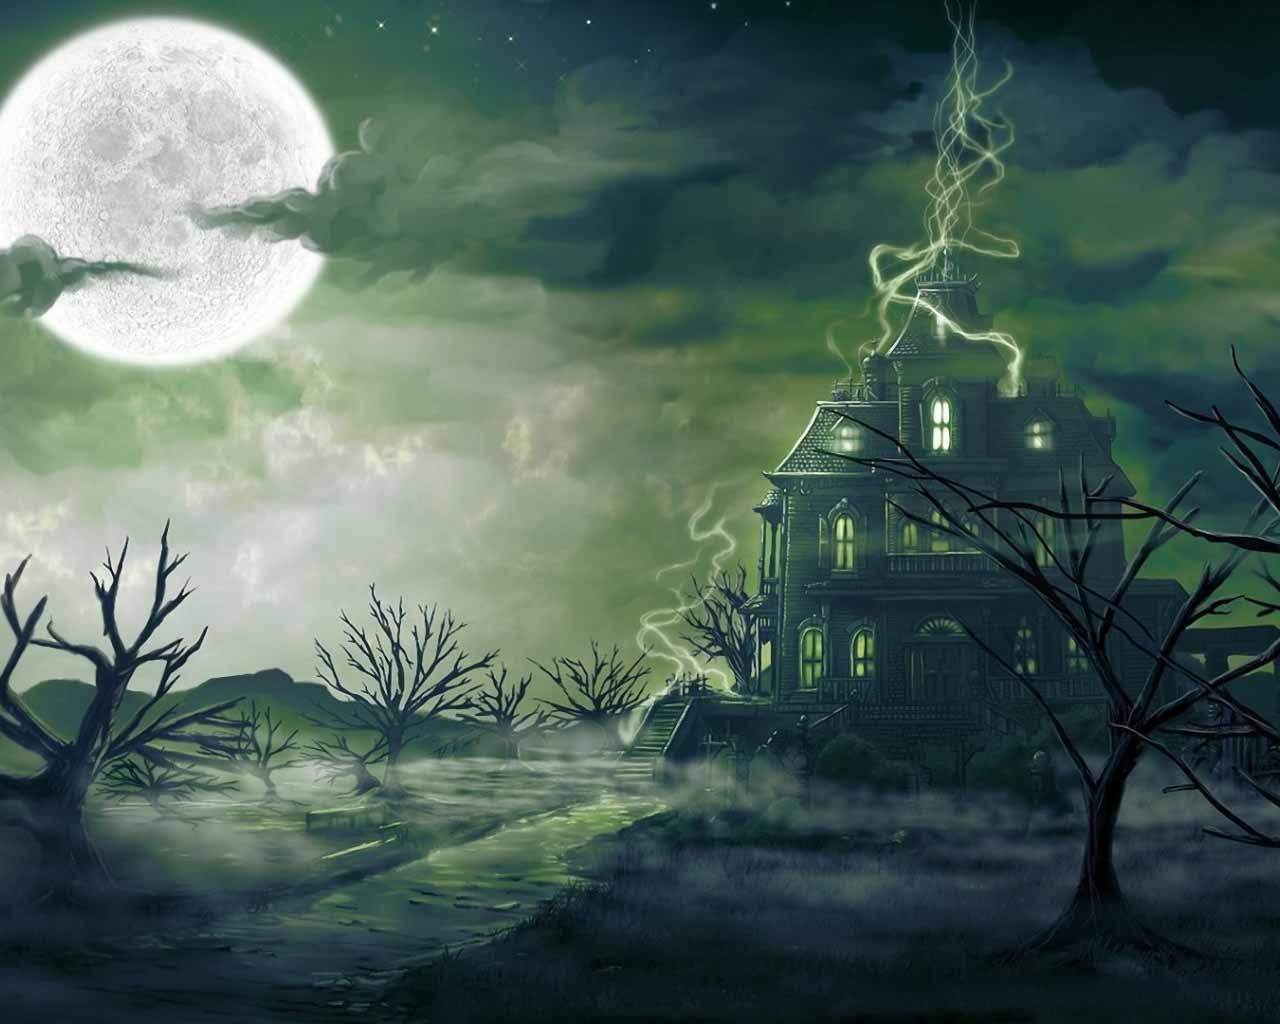 Haunted Mansion Desktop Wallpaper 1280x1024